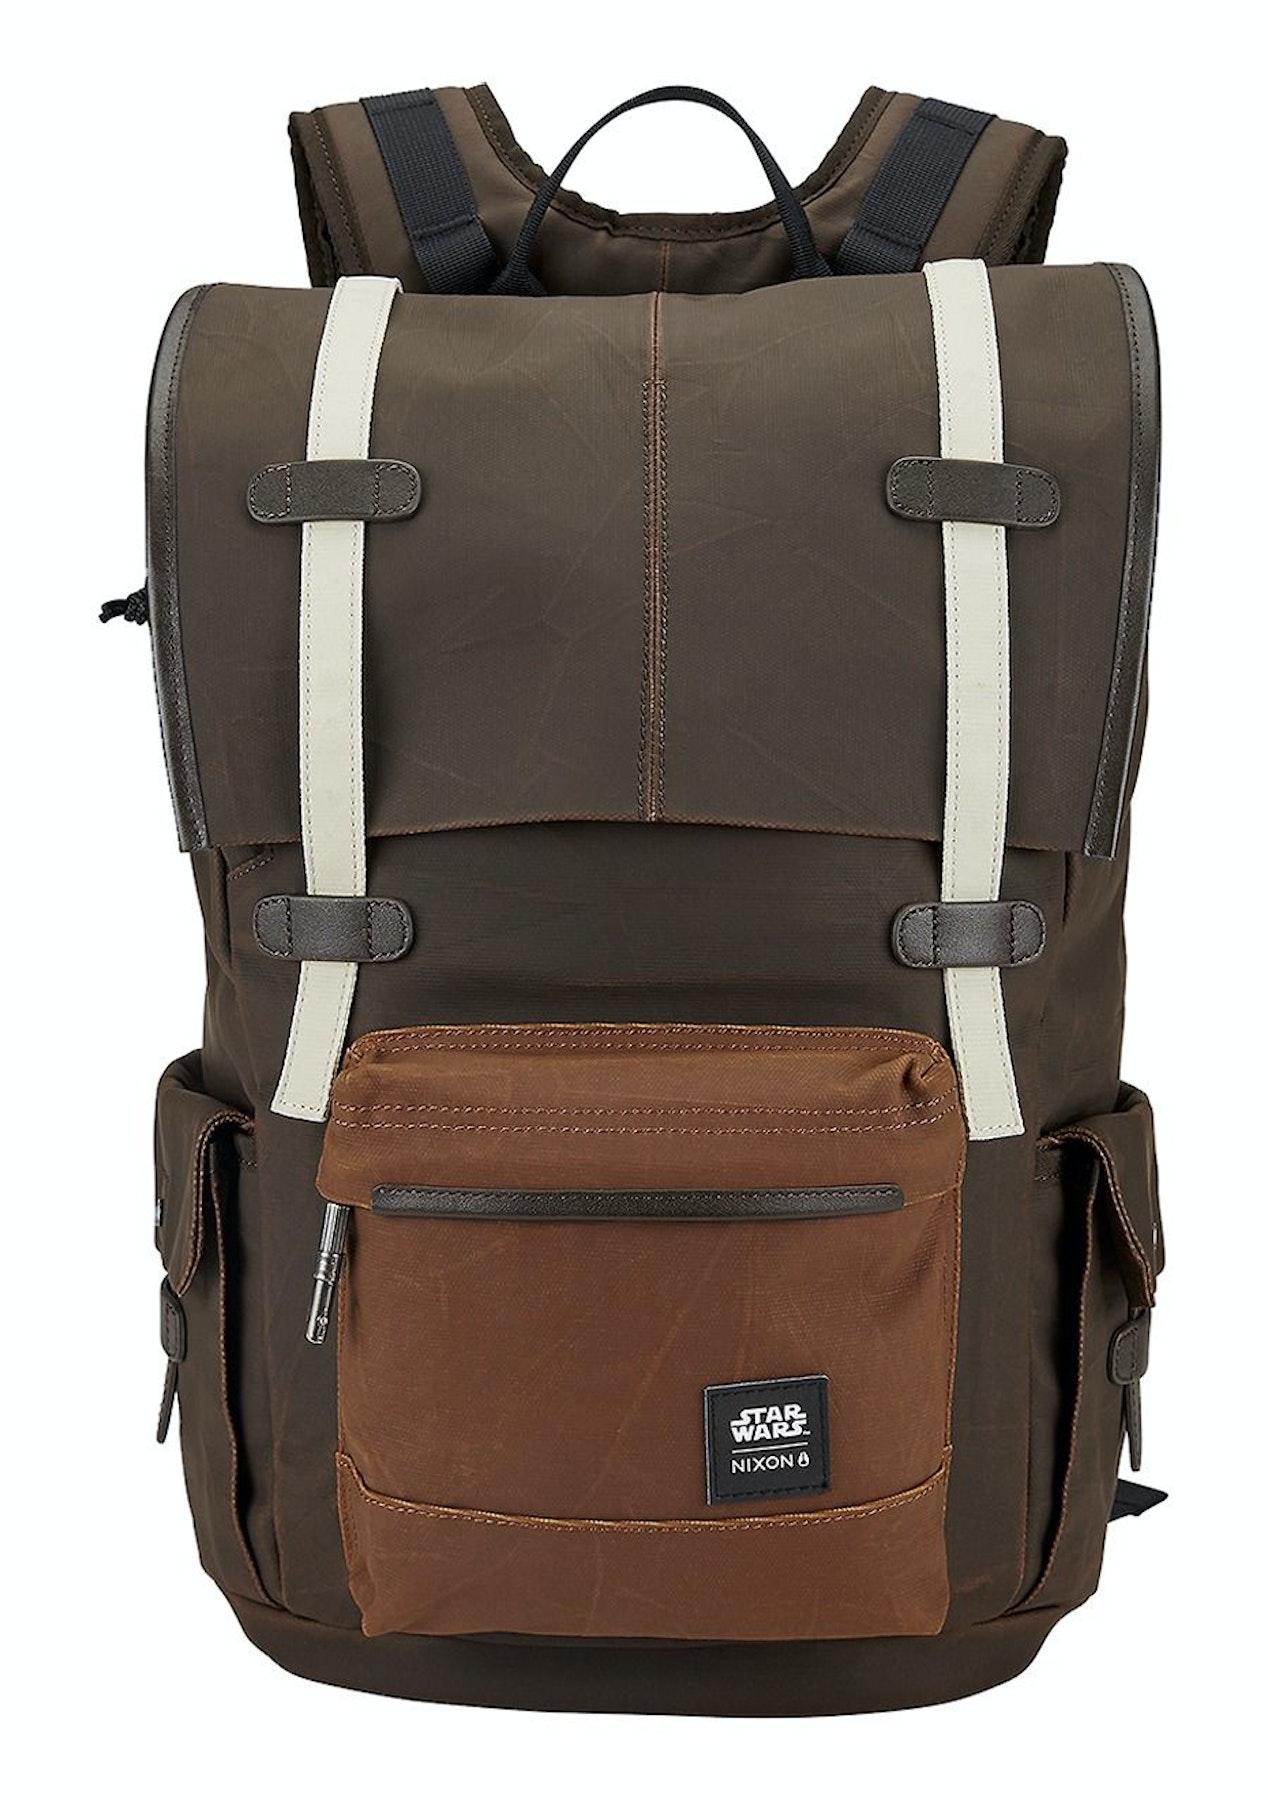 54d9ca2cff1 Nixon Boulder Backpack SW - Nixon Watches   Accessories - Up to 60 ...